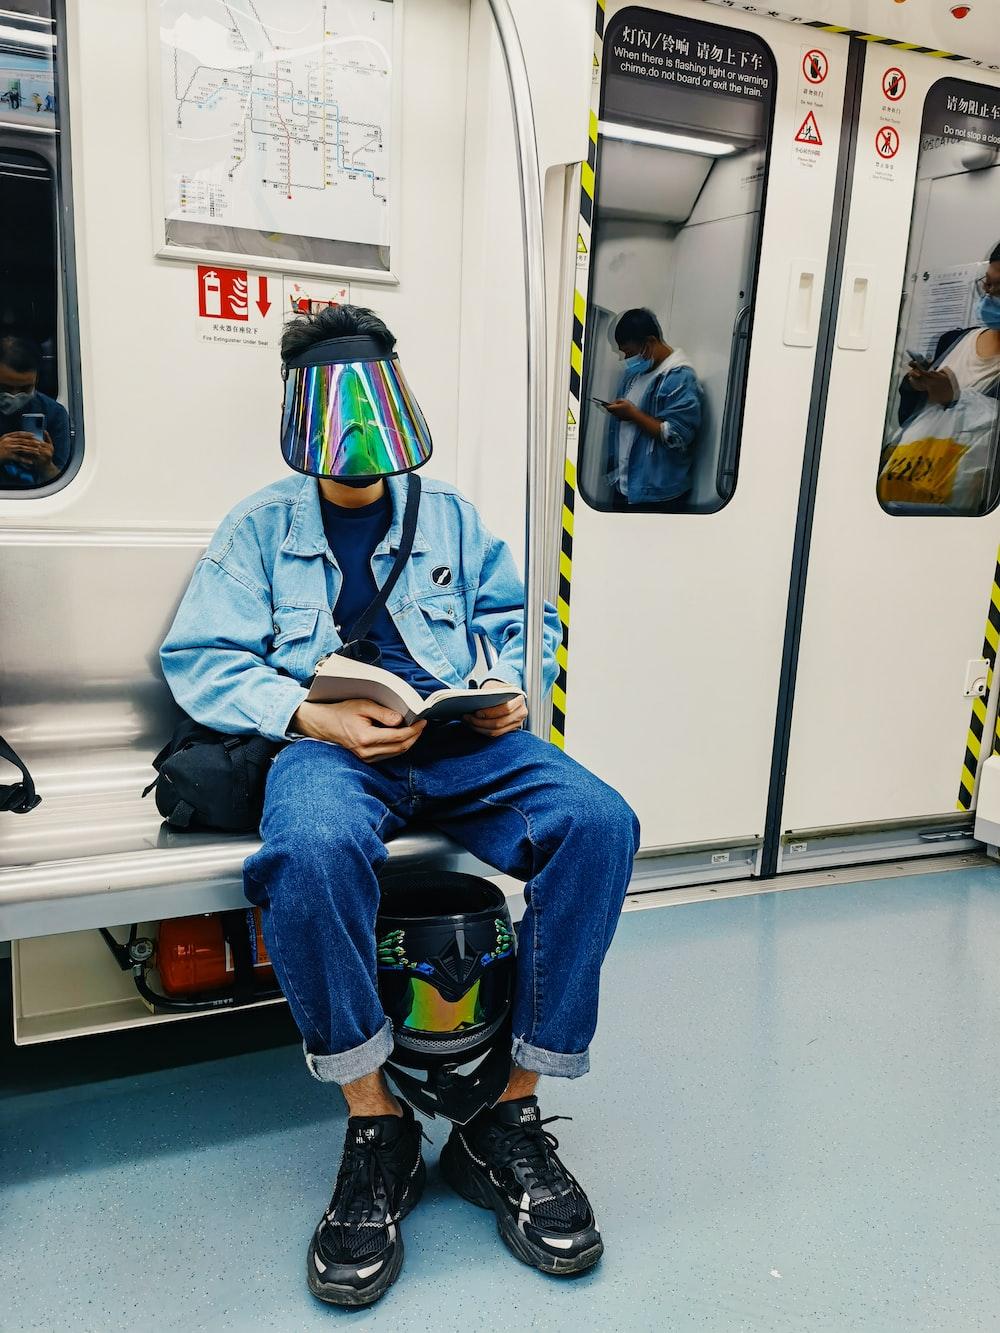 man in blue jacket sitting on train seat